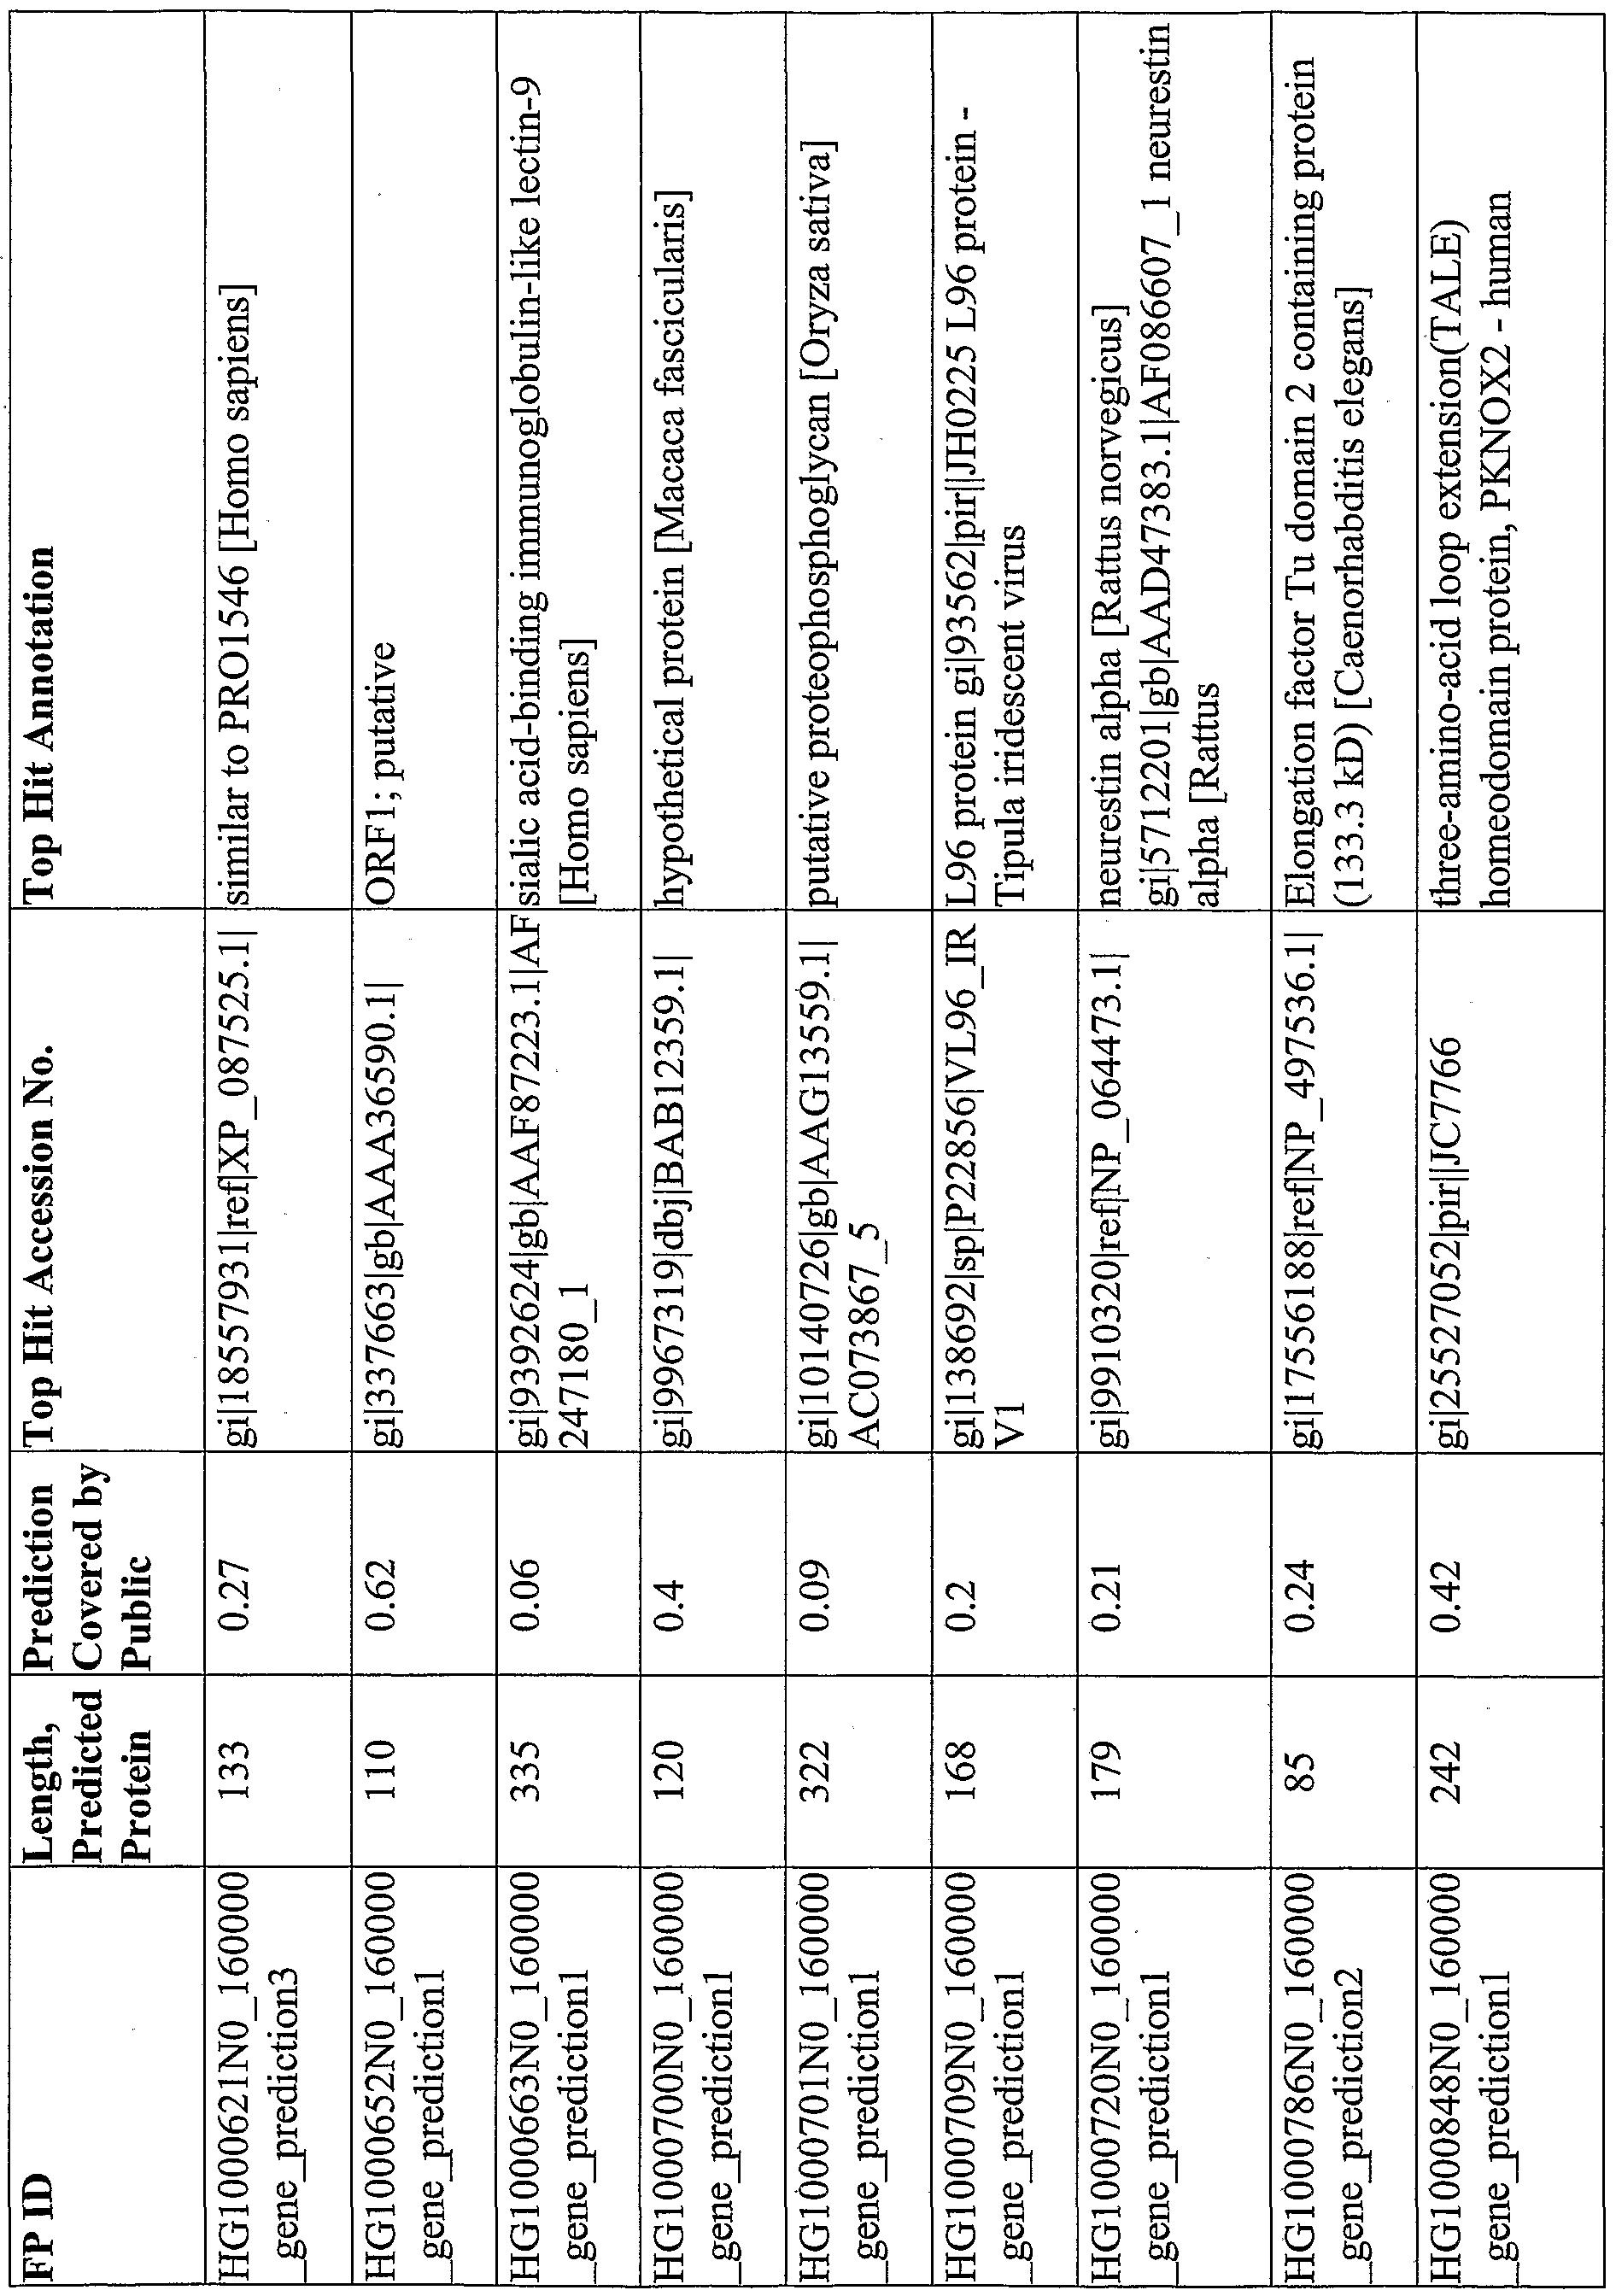 B-Ware-used 75 cm Tubes Quadro Pipe 00572 00573 00574 00575